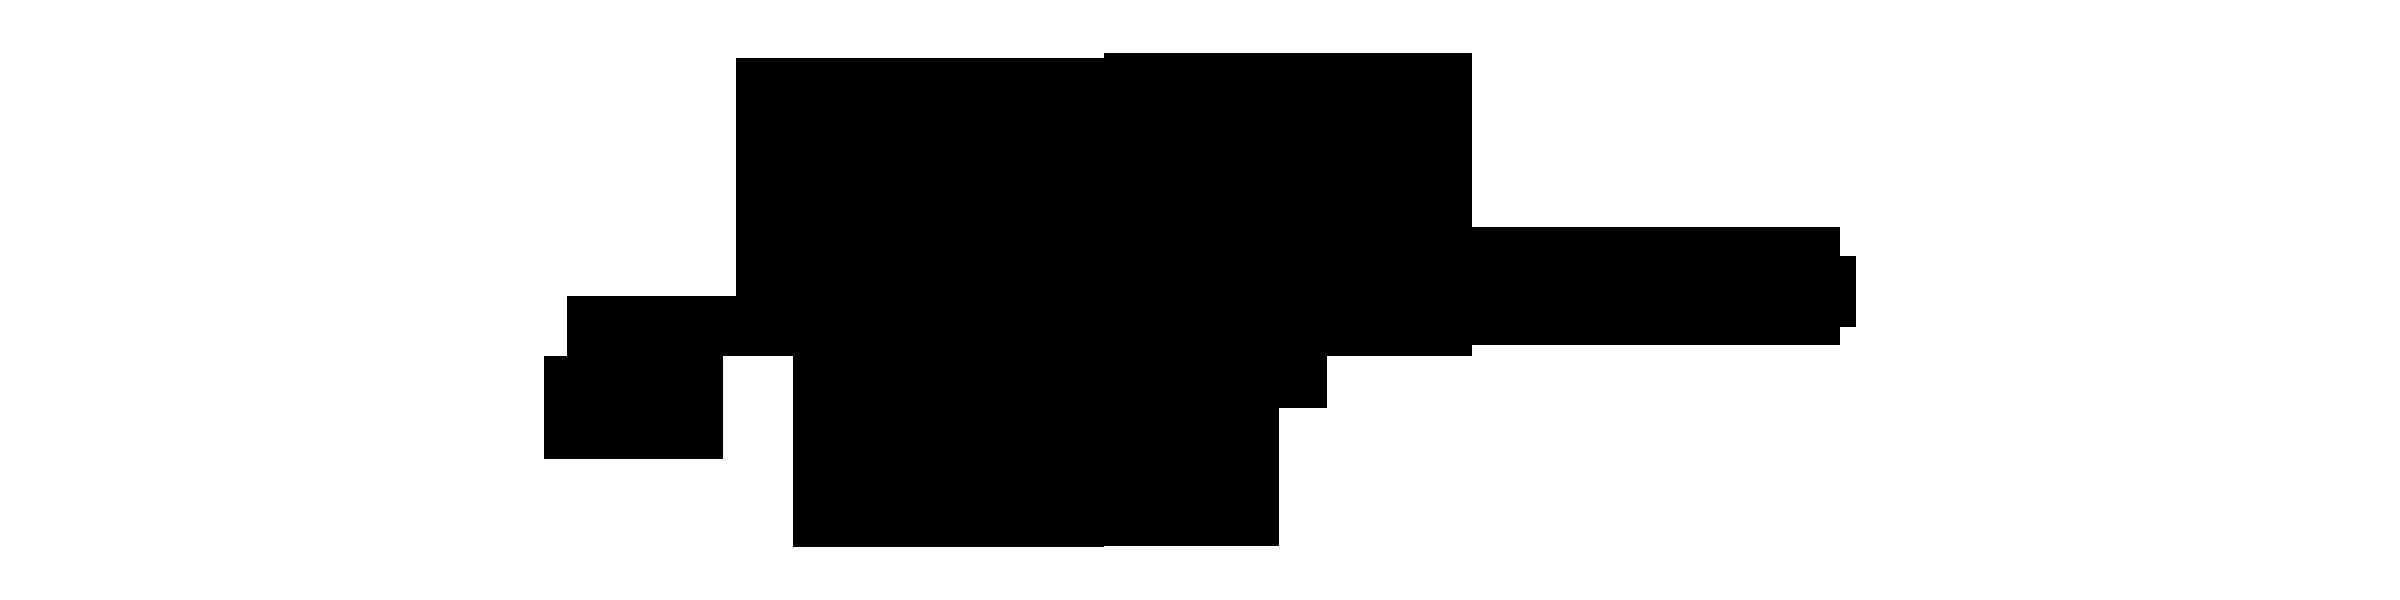 N Com B3 Wiring Diagram Software On Intercom Circuit Xcom Spare Parts